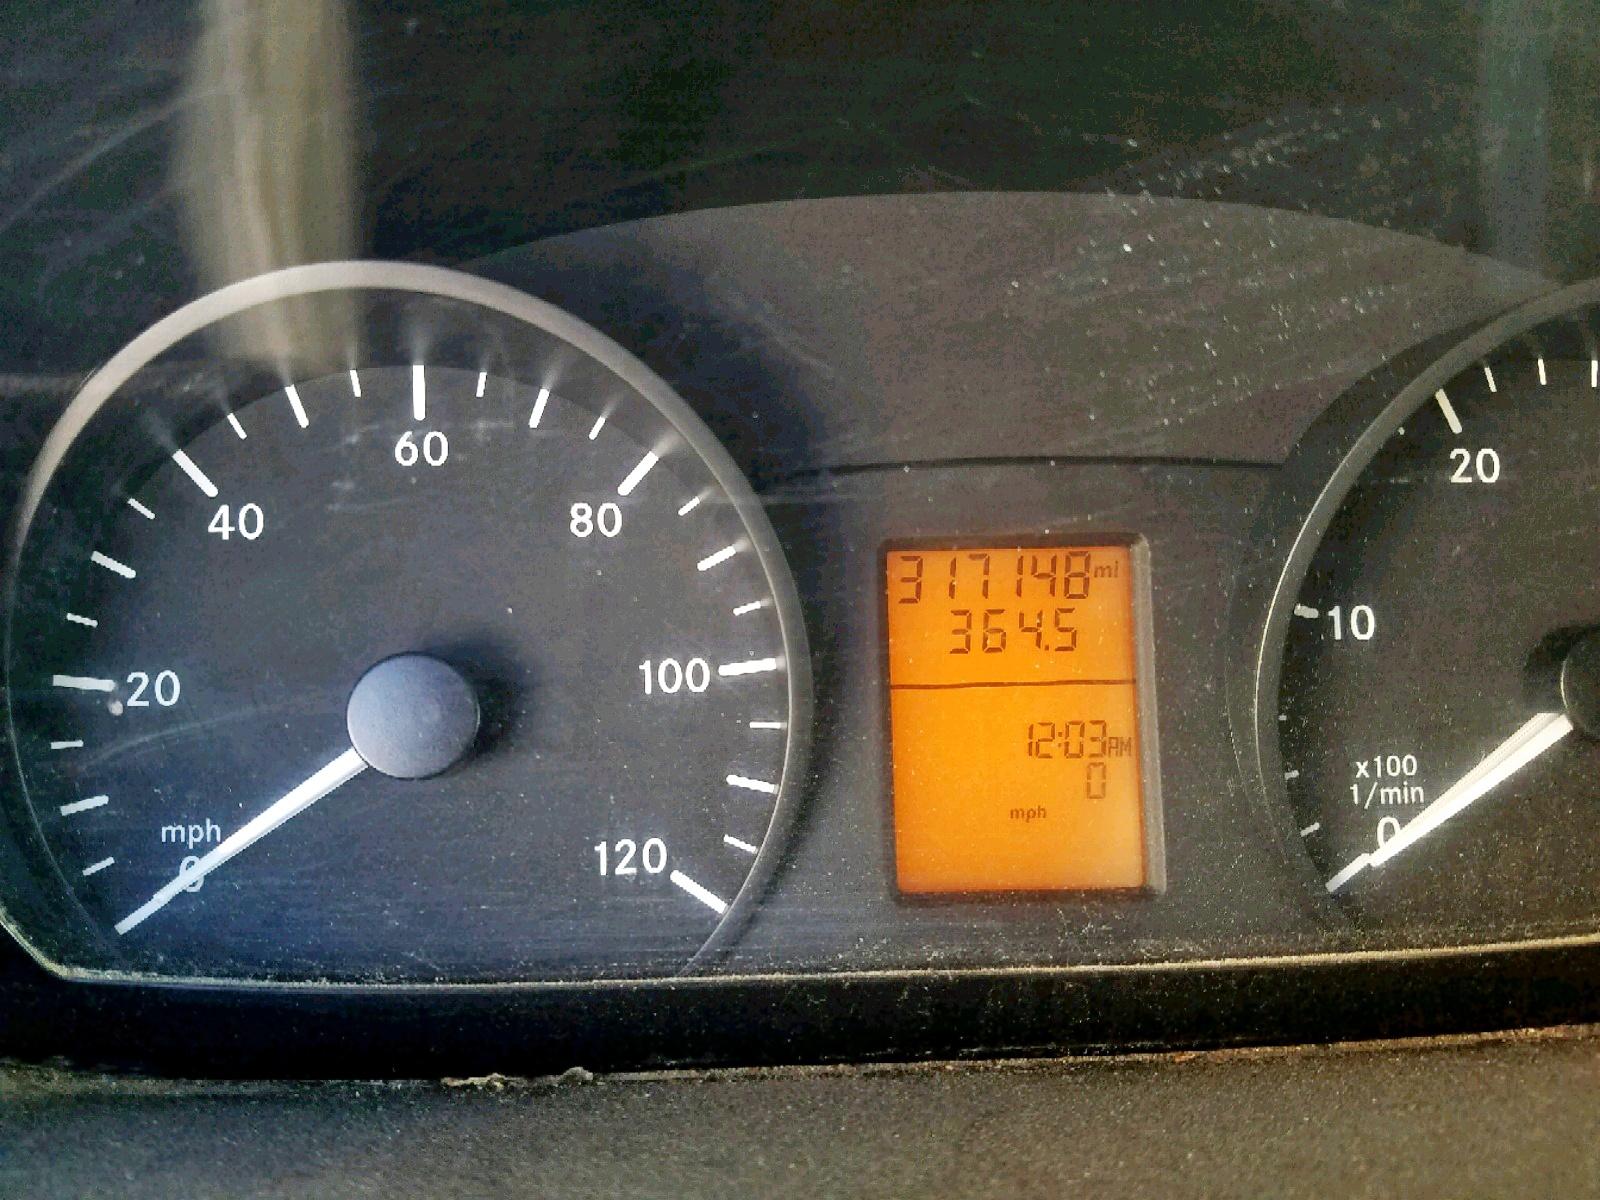 2012 Mercedes-Benz Sprinter 2 3.0L front view